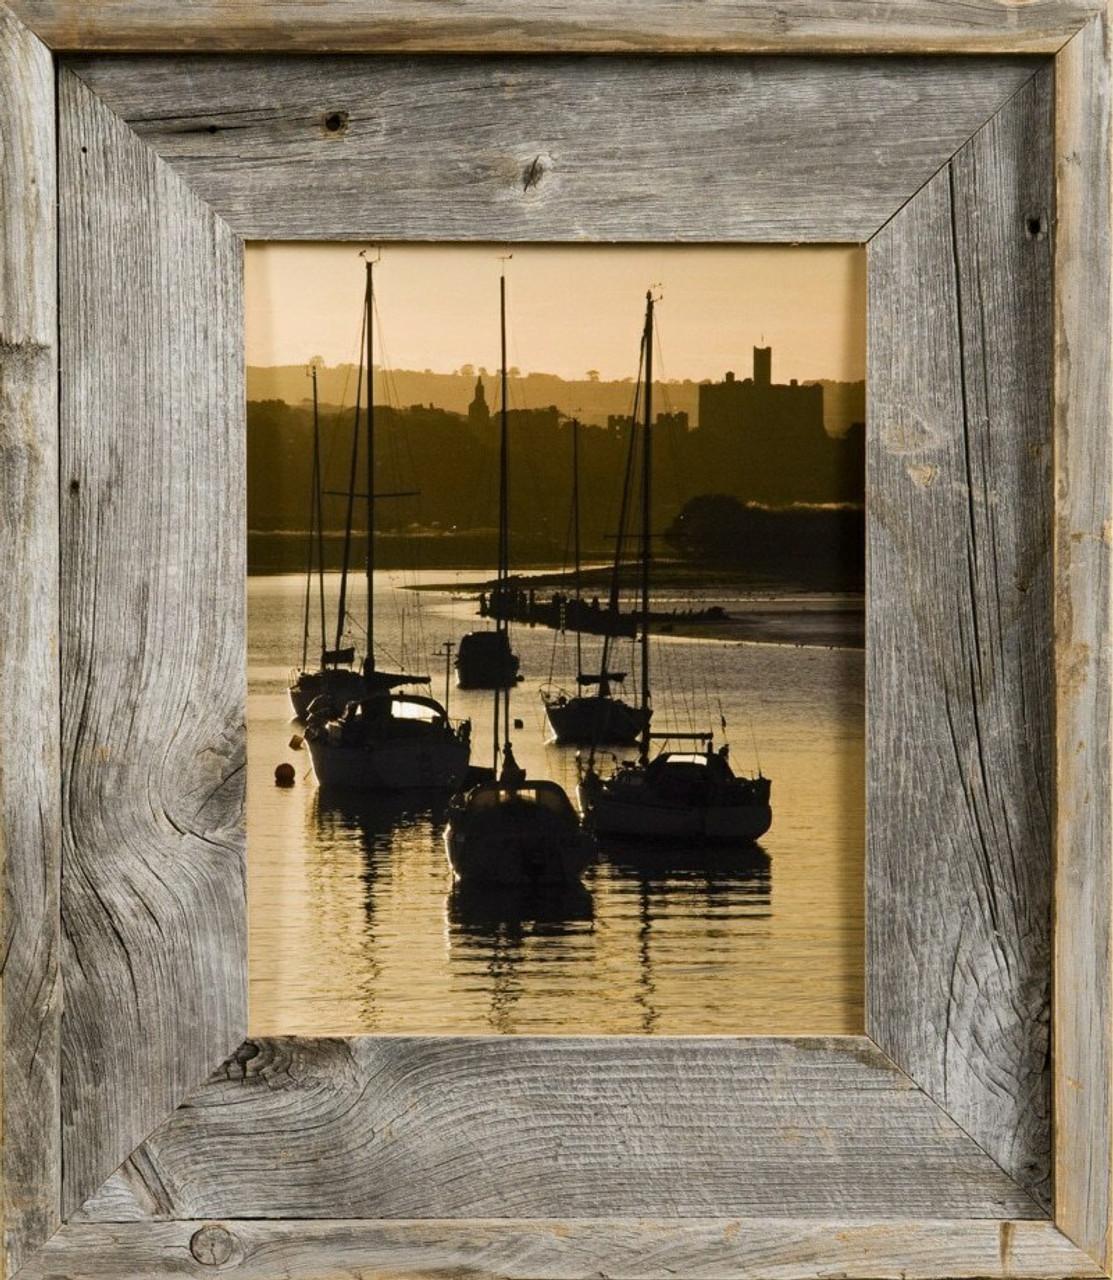 Barnwood Picture Frames | 8x8 Rustic Wood Frames